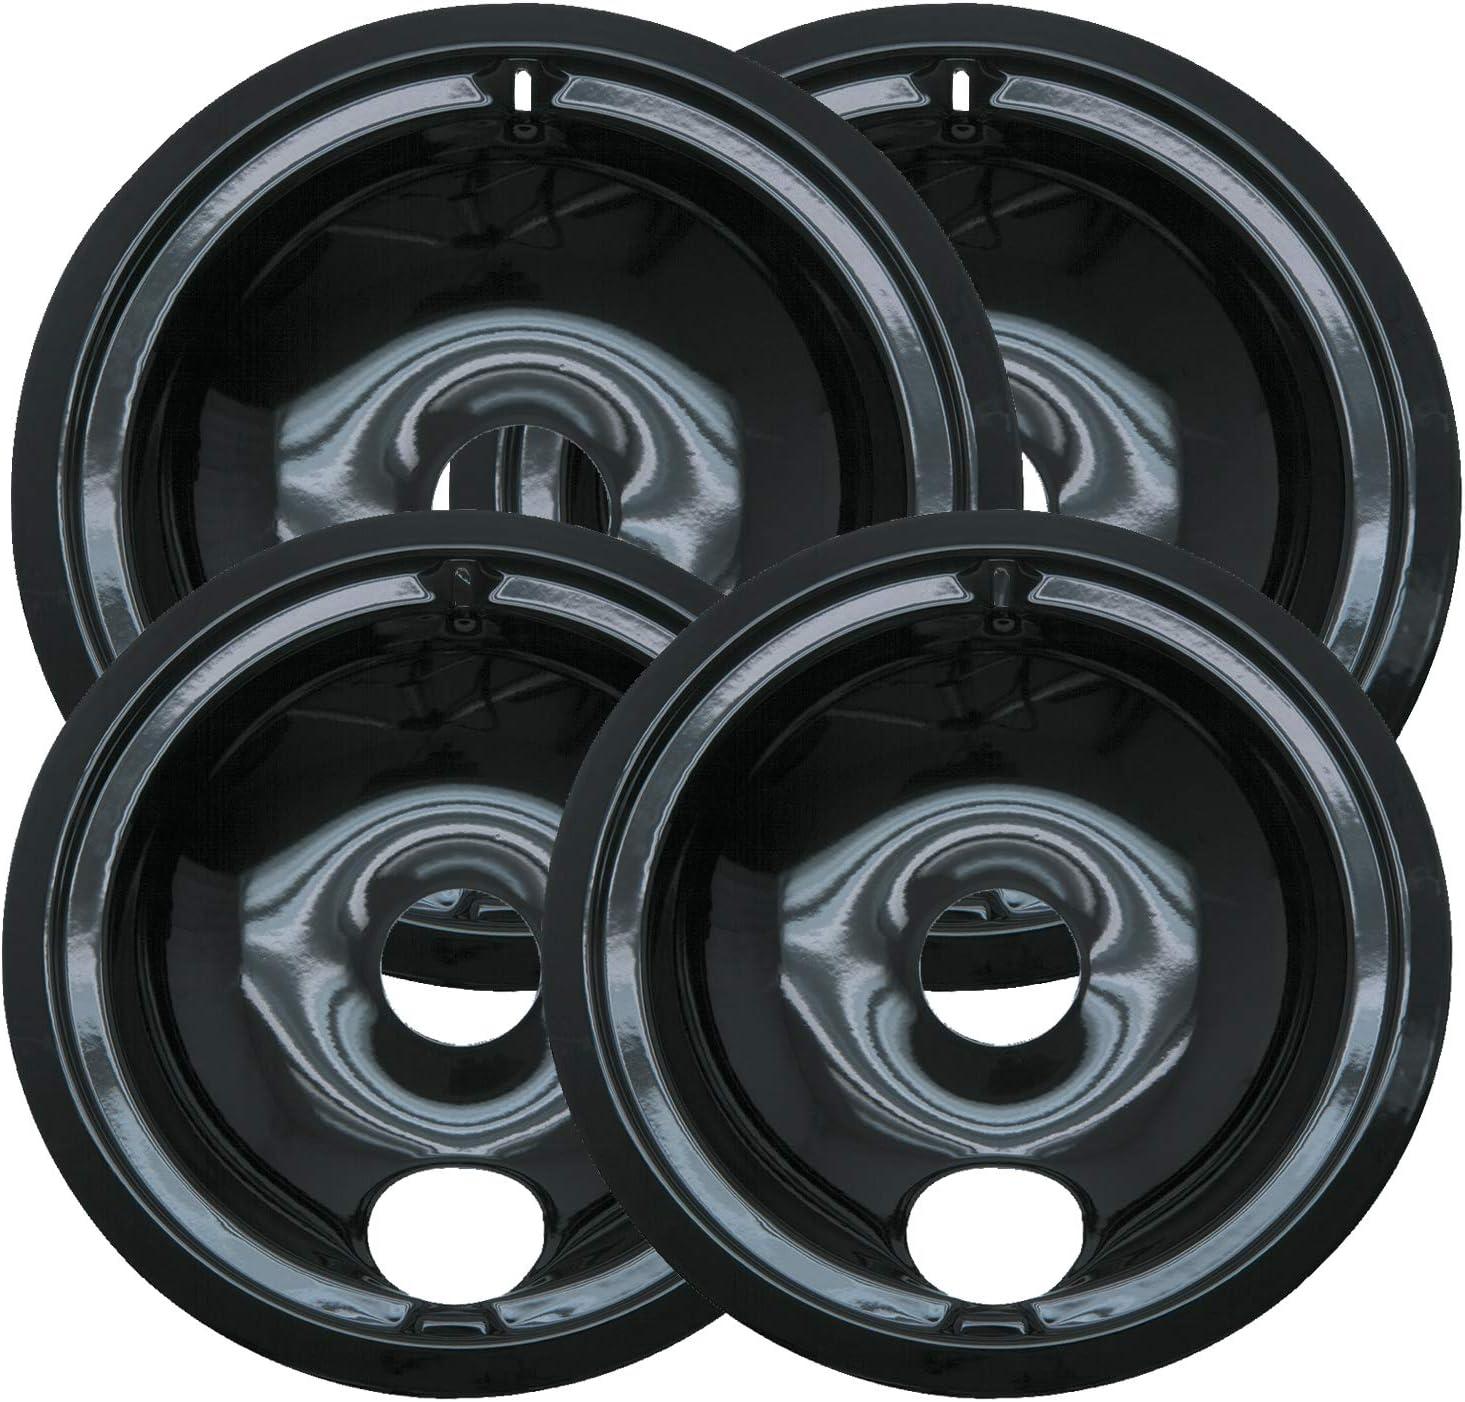 ClimaTek Range 8 Black Porcelain Burner Drip Bowl fits Sears WB32K5042 AP2028152 258110